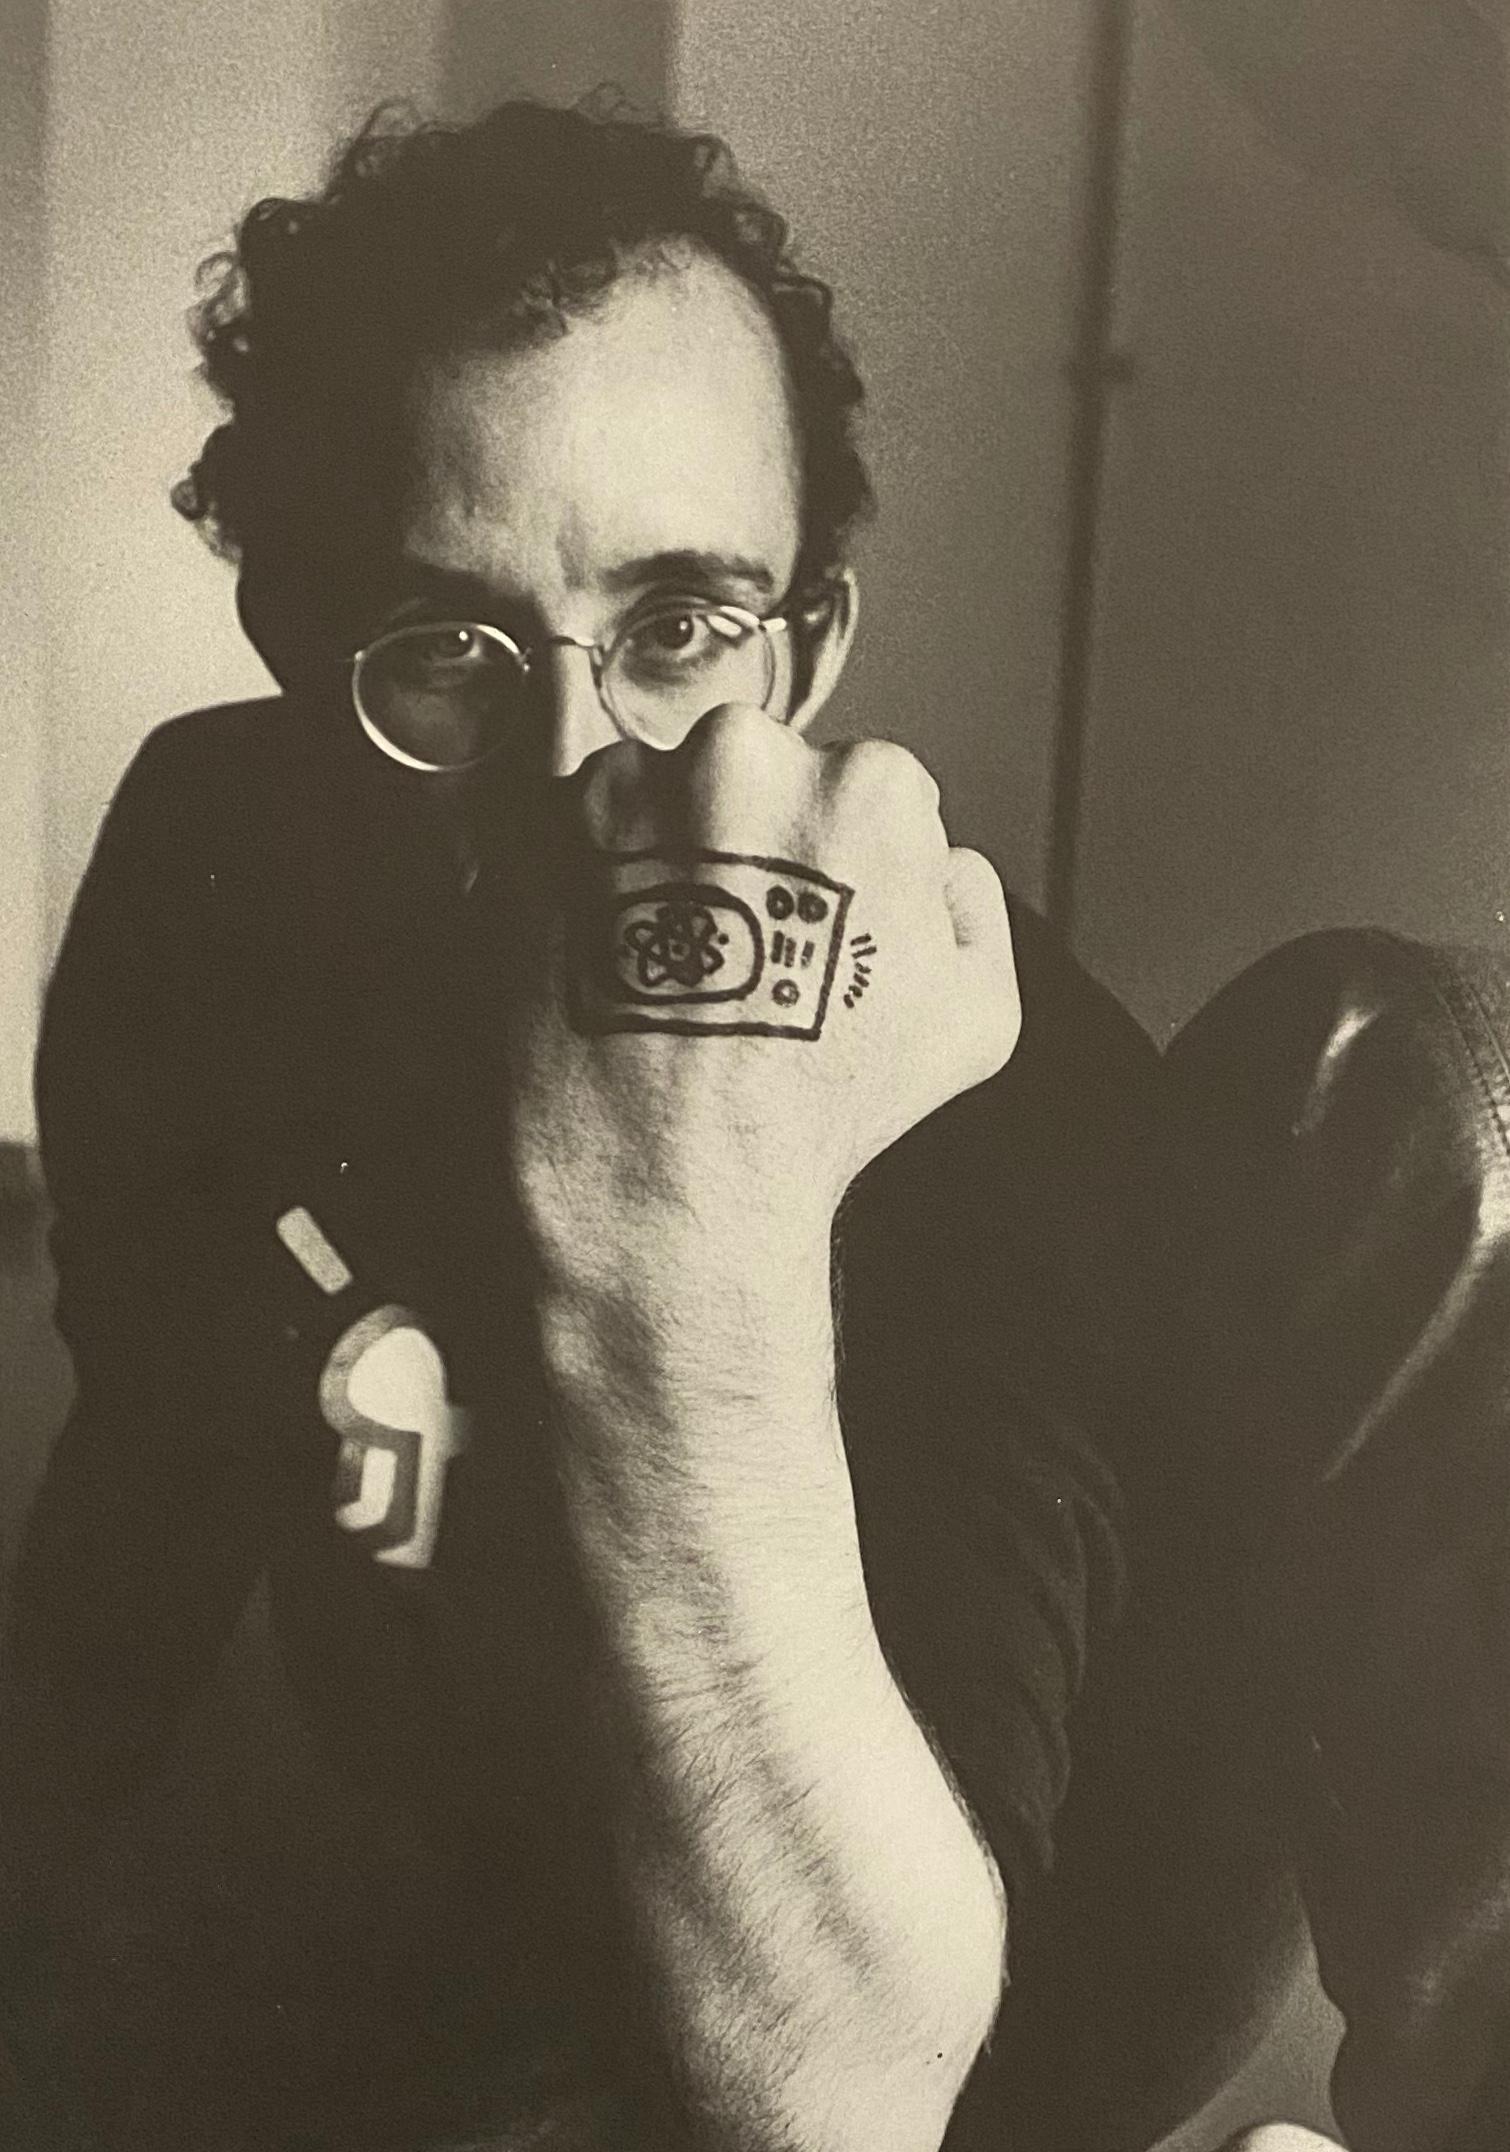 Keith Haring 1984 exhibition catalog (Keith Haring Paul Maenz 1984)